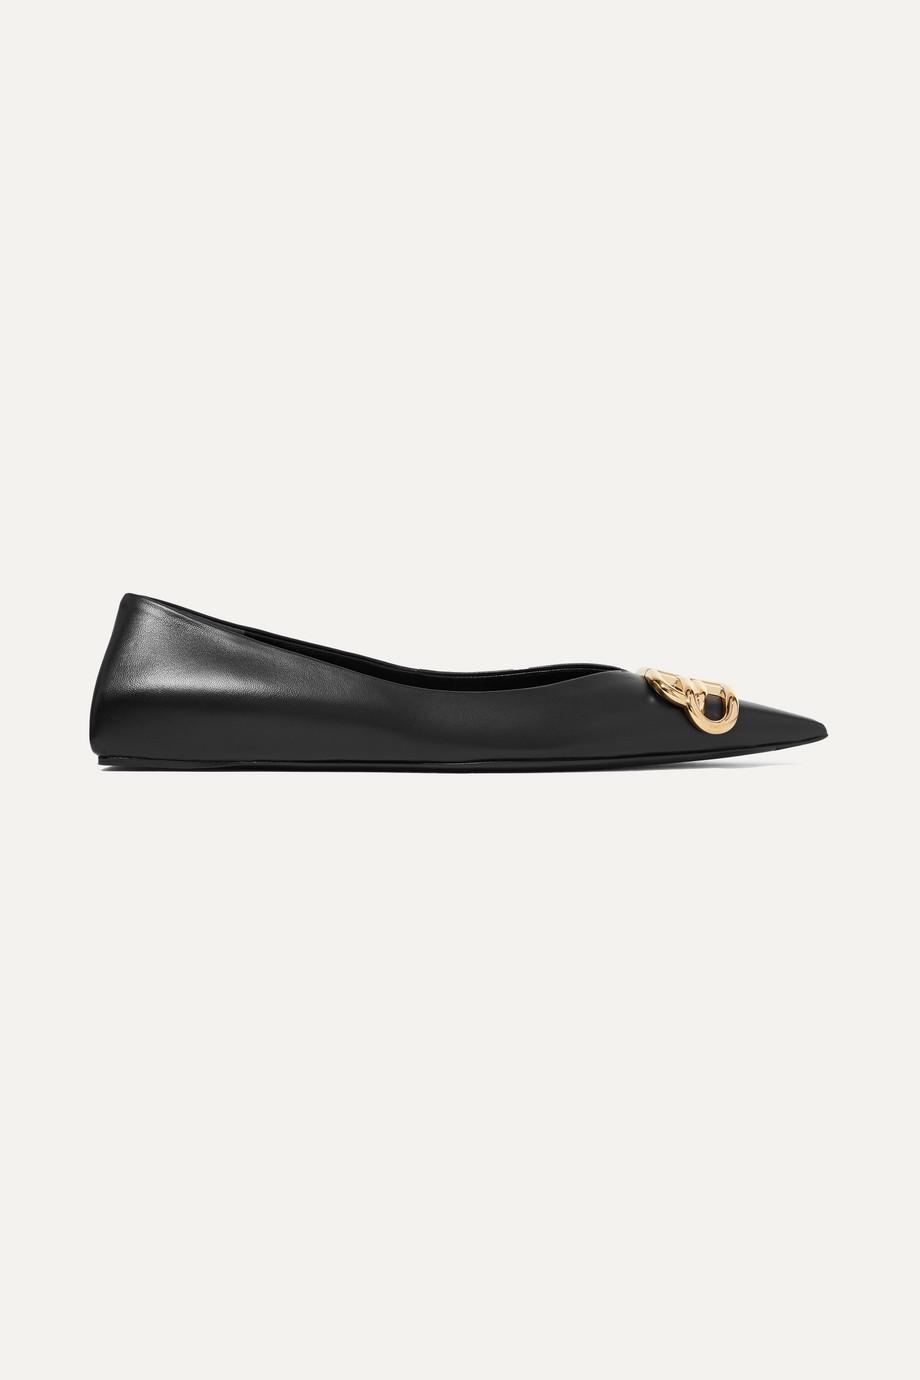 Balenciaga Square Knife logo-embellished leather point-toe flats